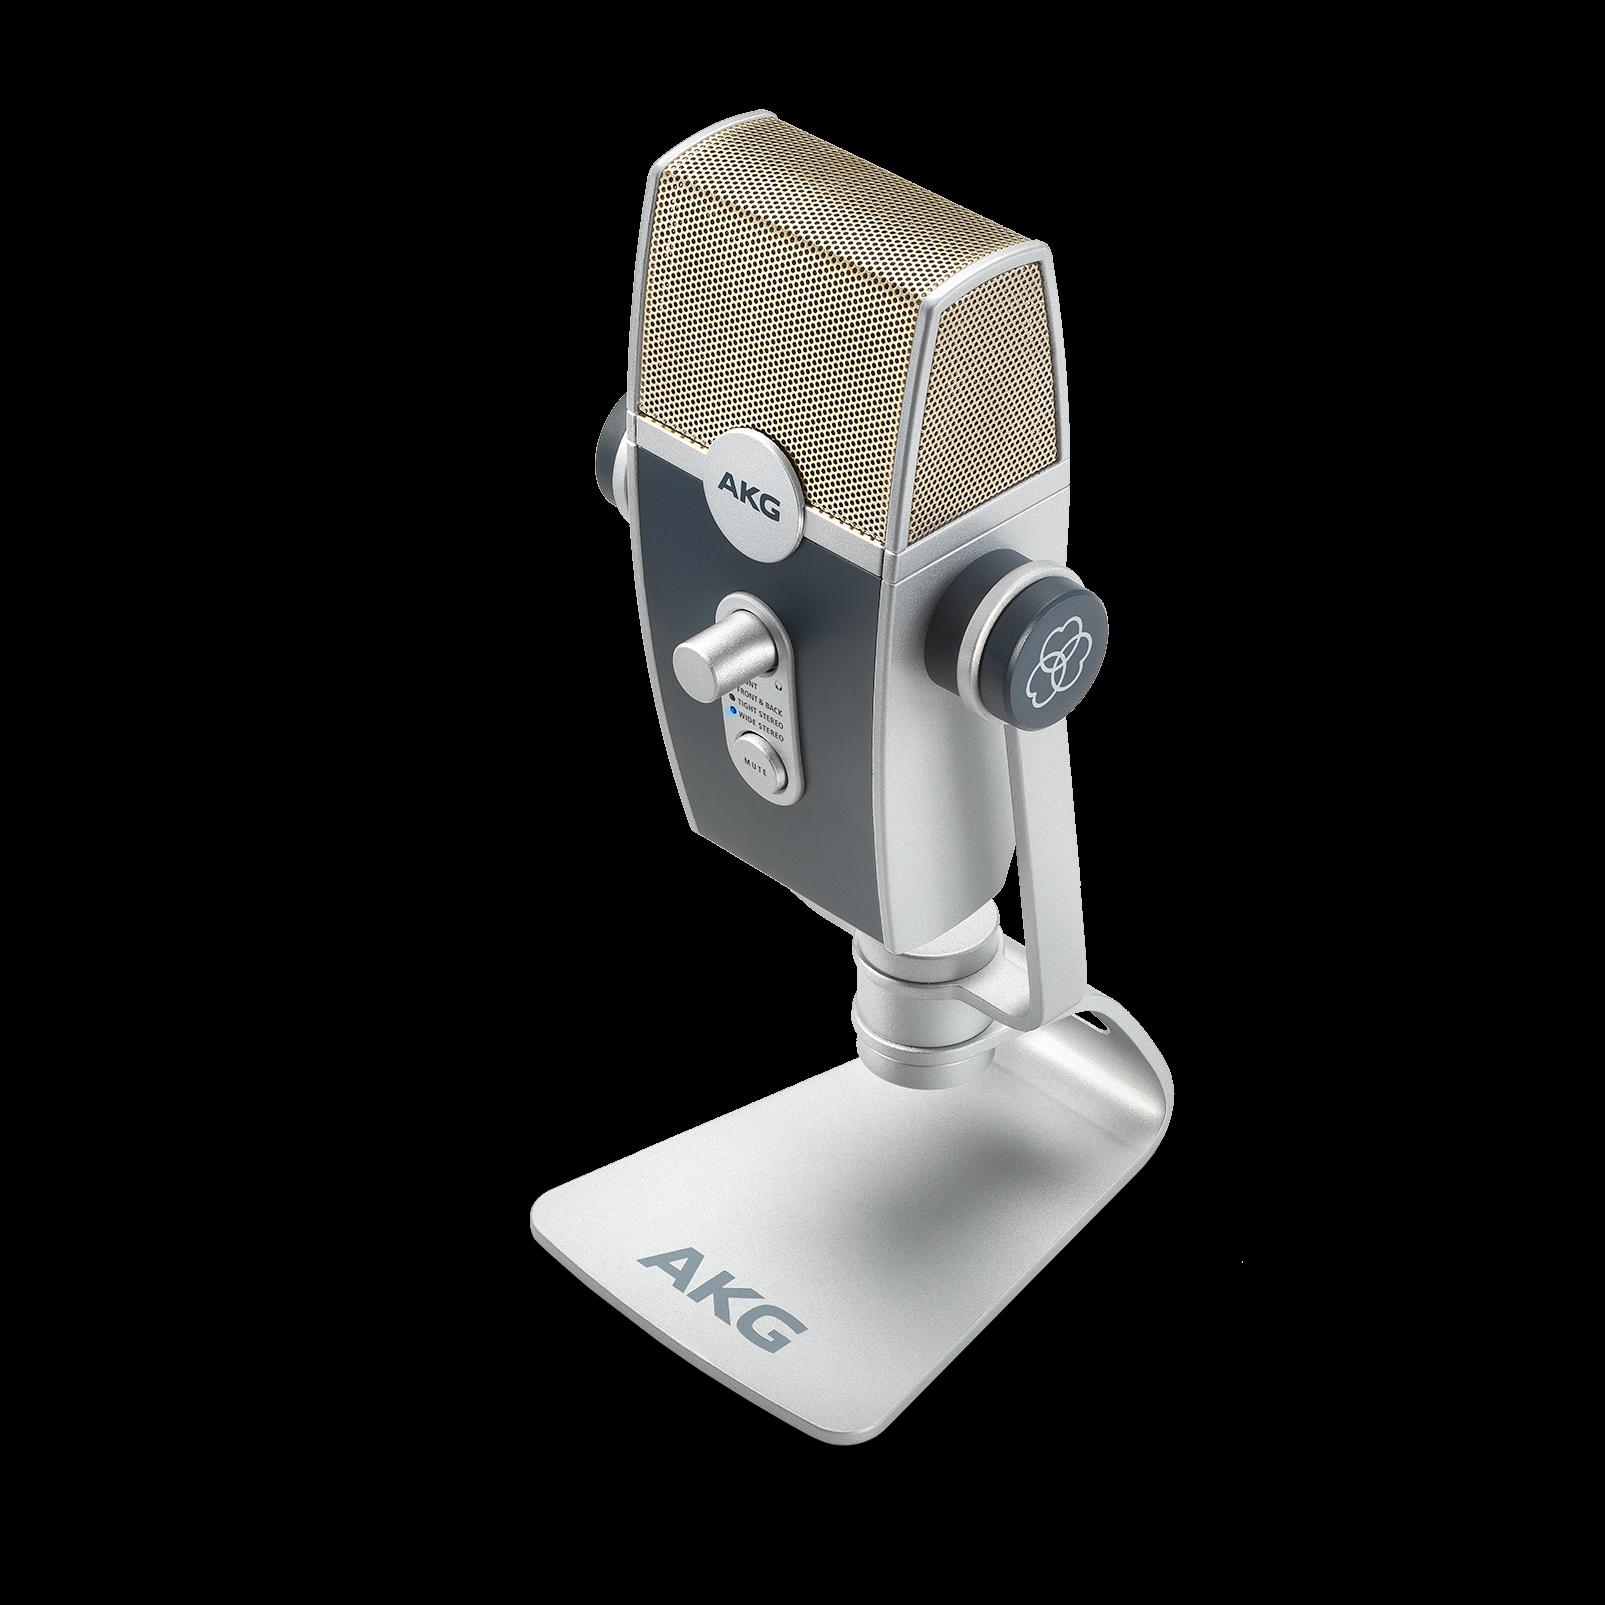 AKG Lyra - Silver - Ultra-HD Multimode USB Microphone  - Detailshot 3